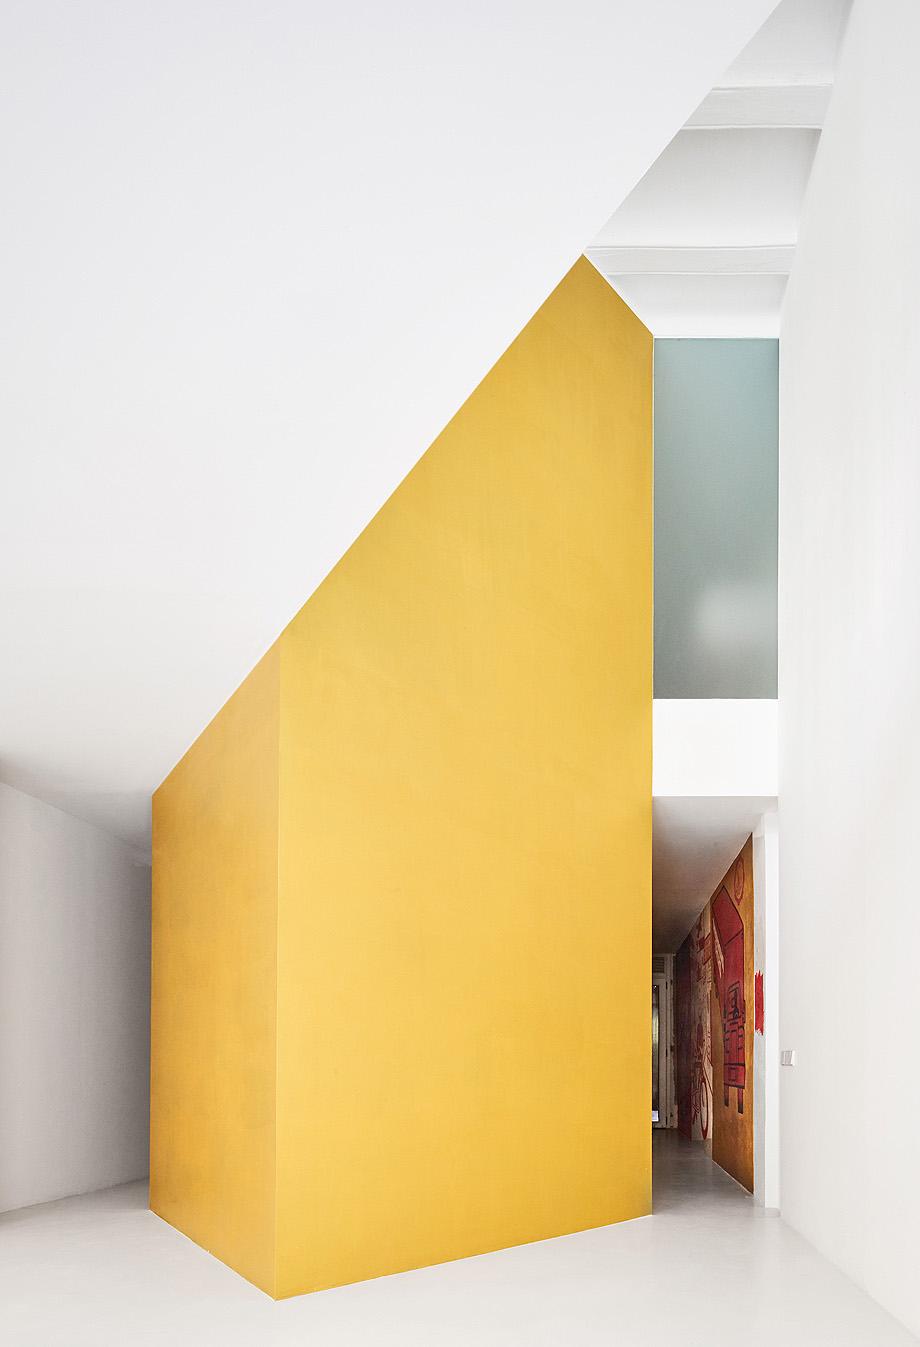 dúplex tibbaut de ras arquitectura (13)